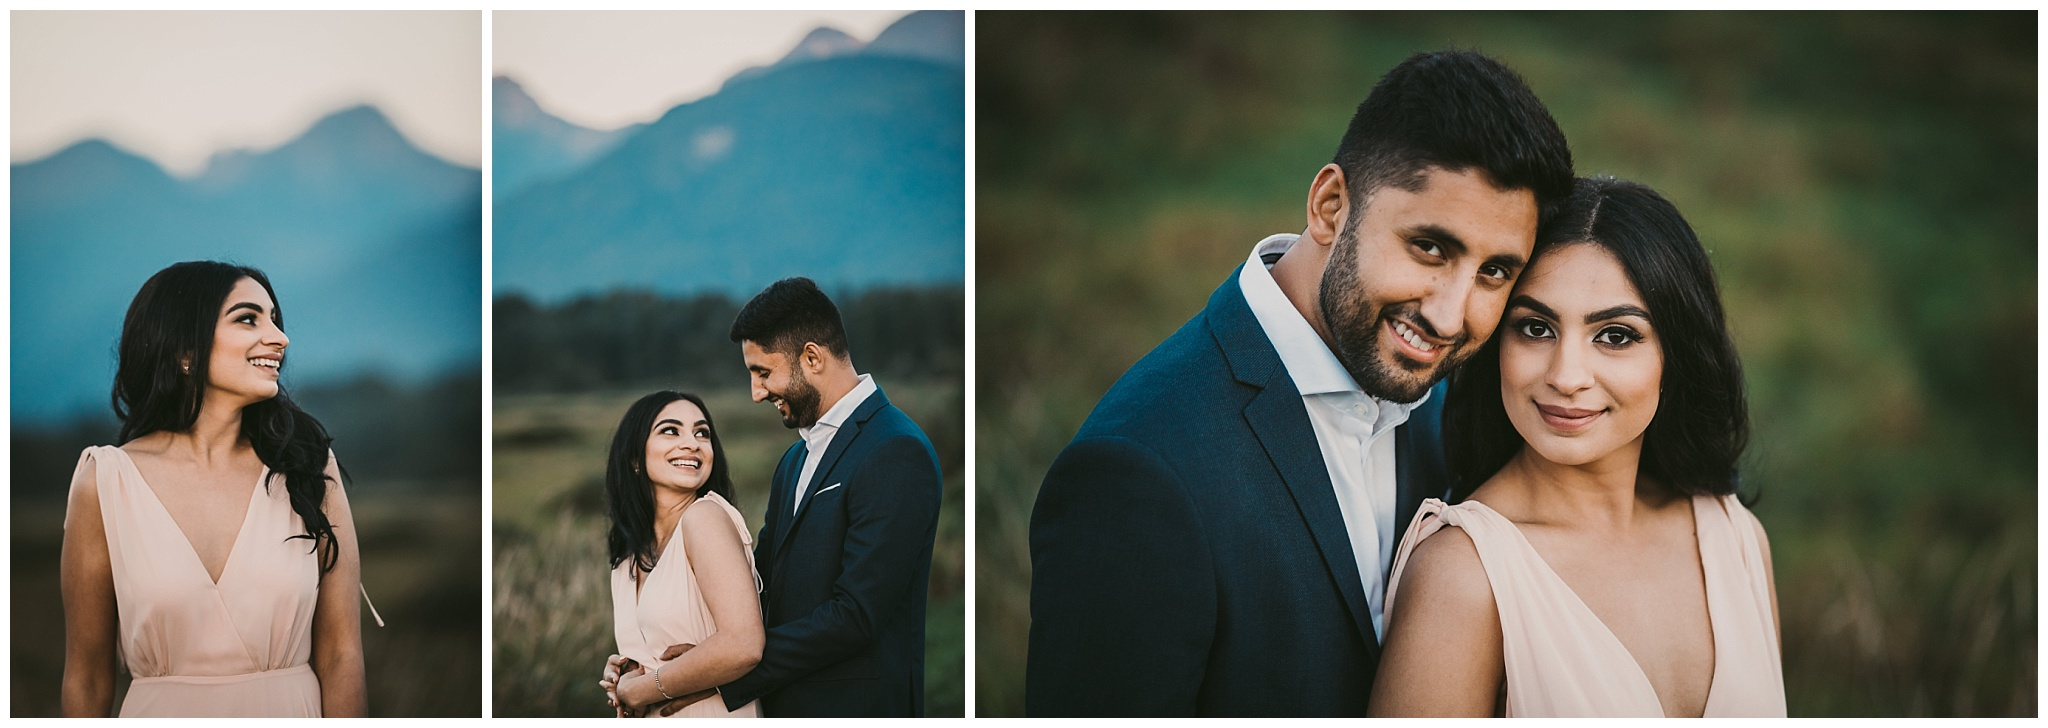 Surrey-Engagement-Photographer- 3.jpg